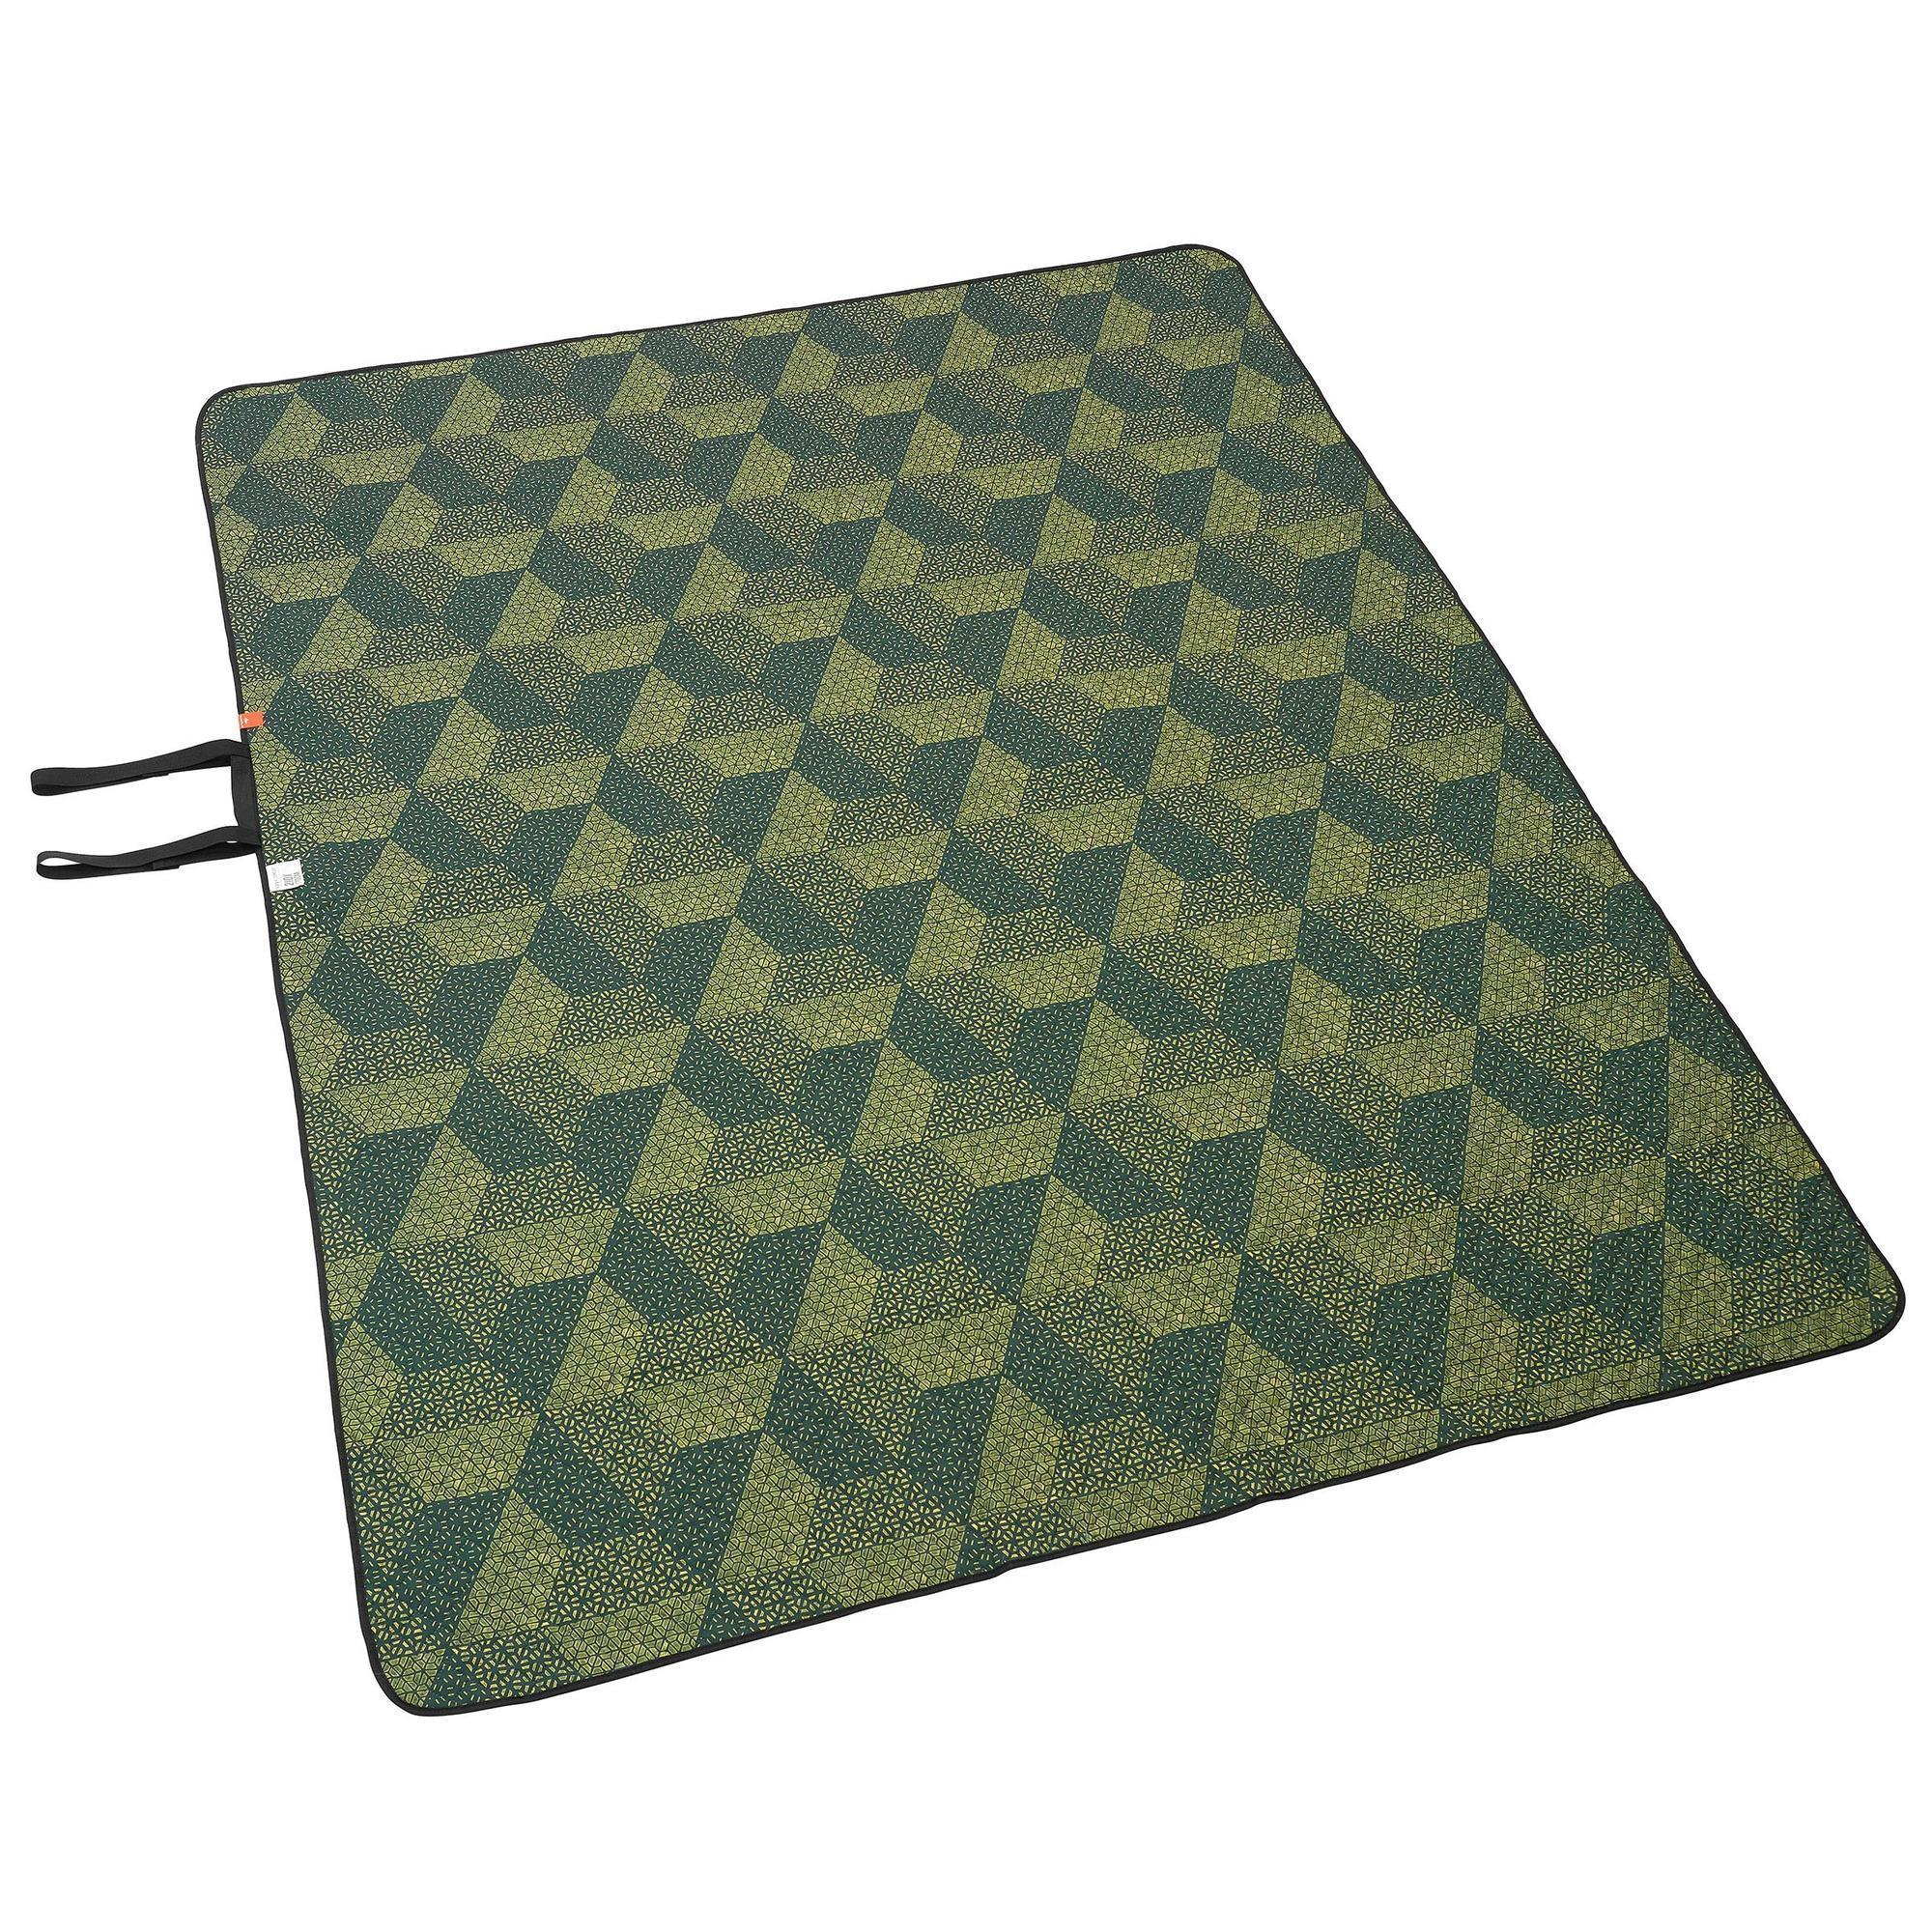 tapis de relaxation decathlon coussin de mditation decathlon elegant zafu coussin yoga. Black Bedroom Furniture Sets. Home Design Ideas